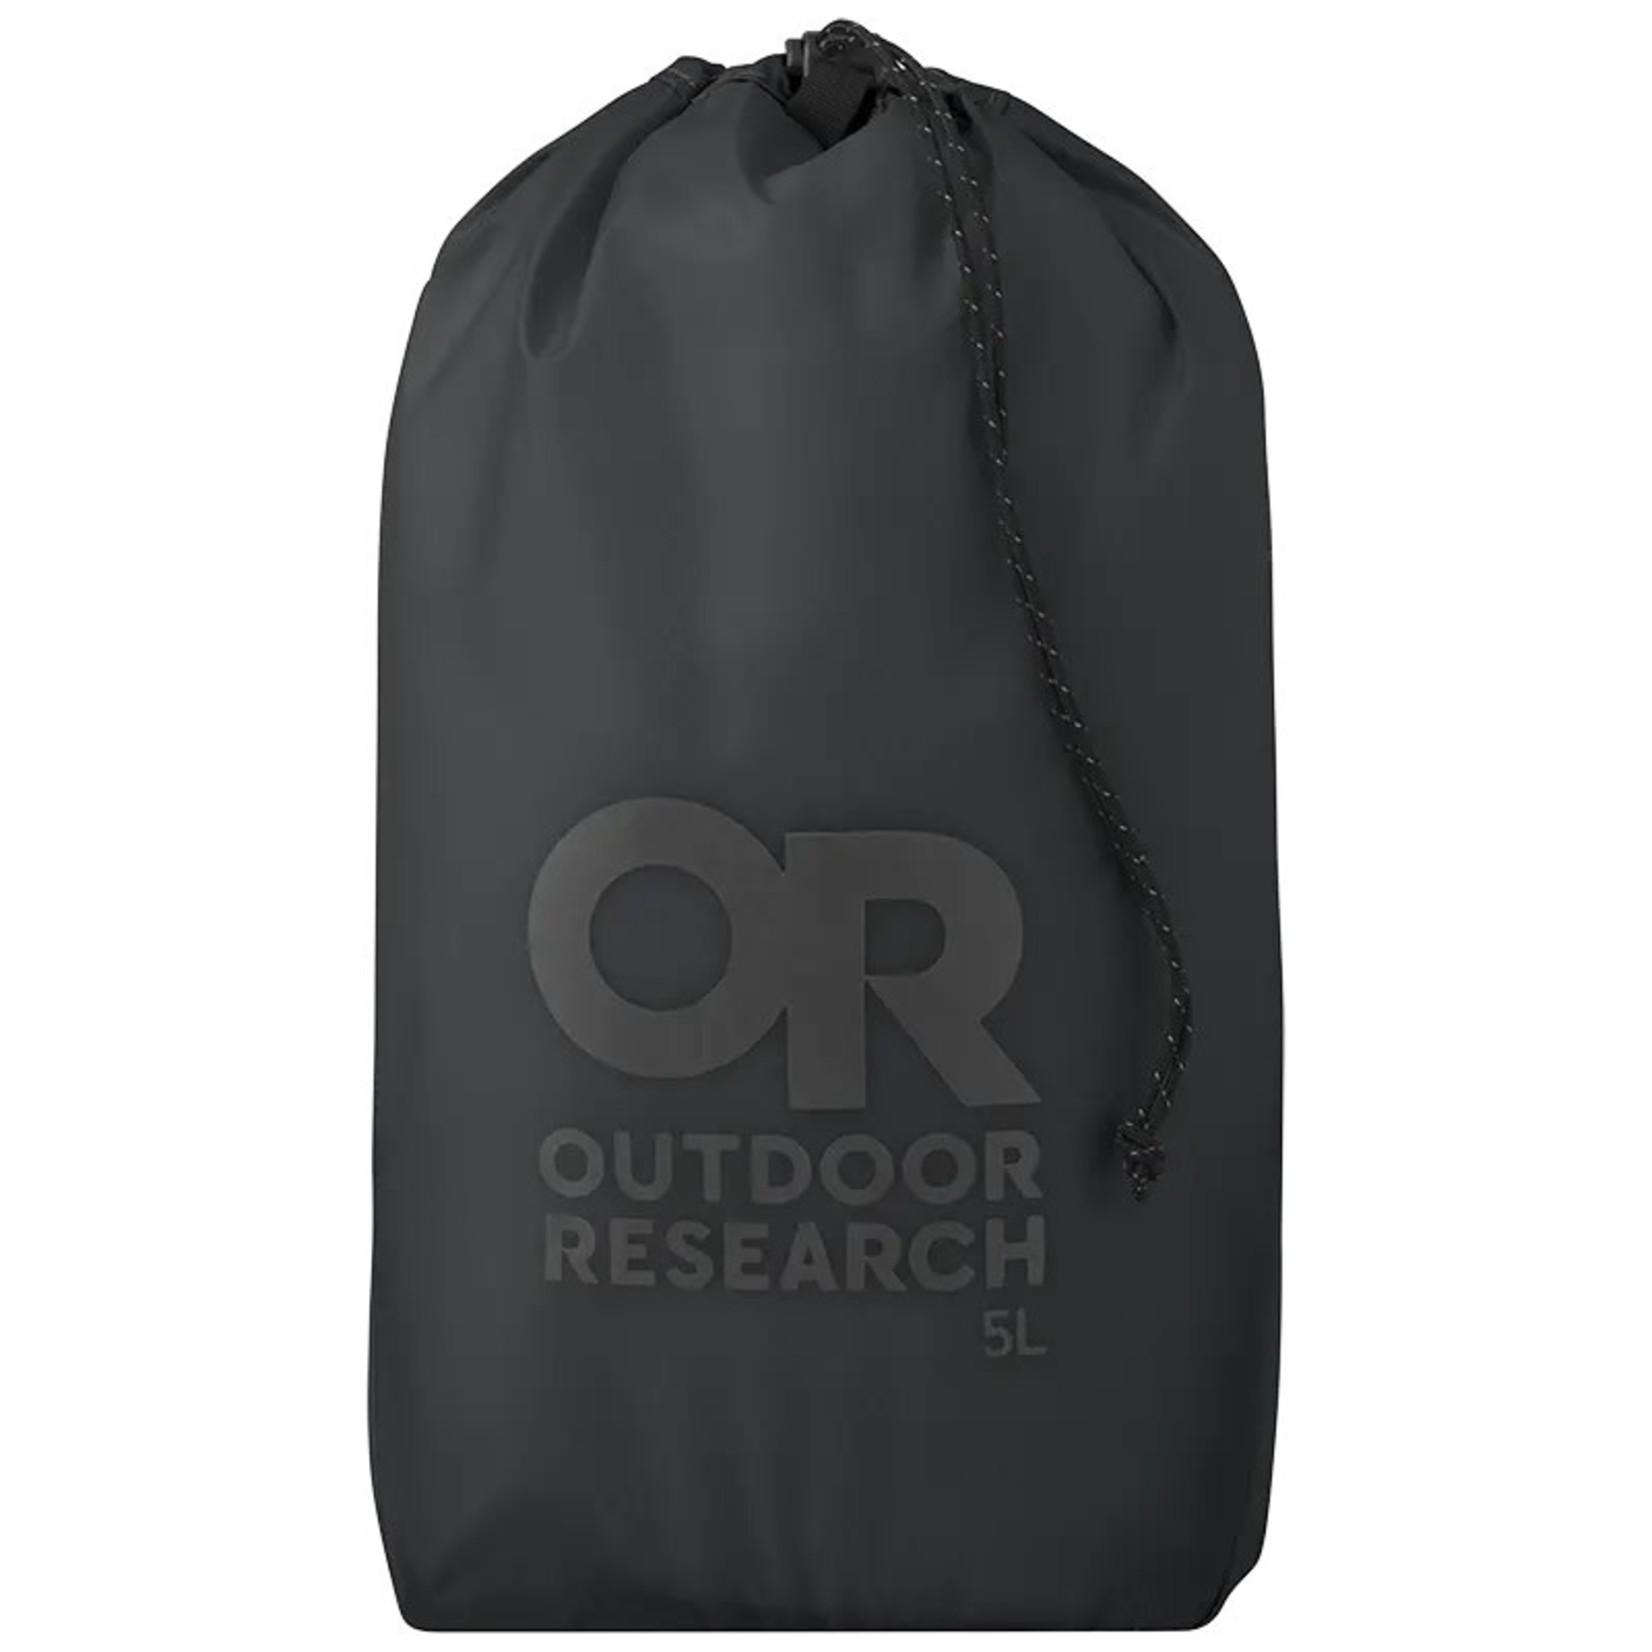 Outdoor Research Sac de rangement Outdoor Research Ultralight - 5L